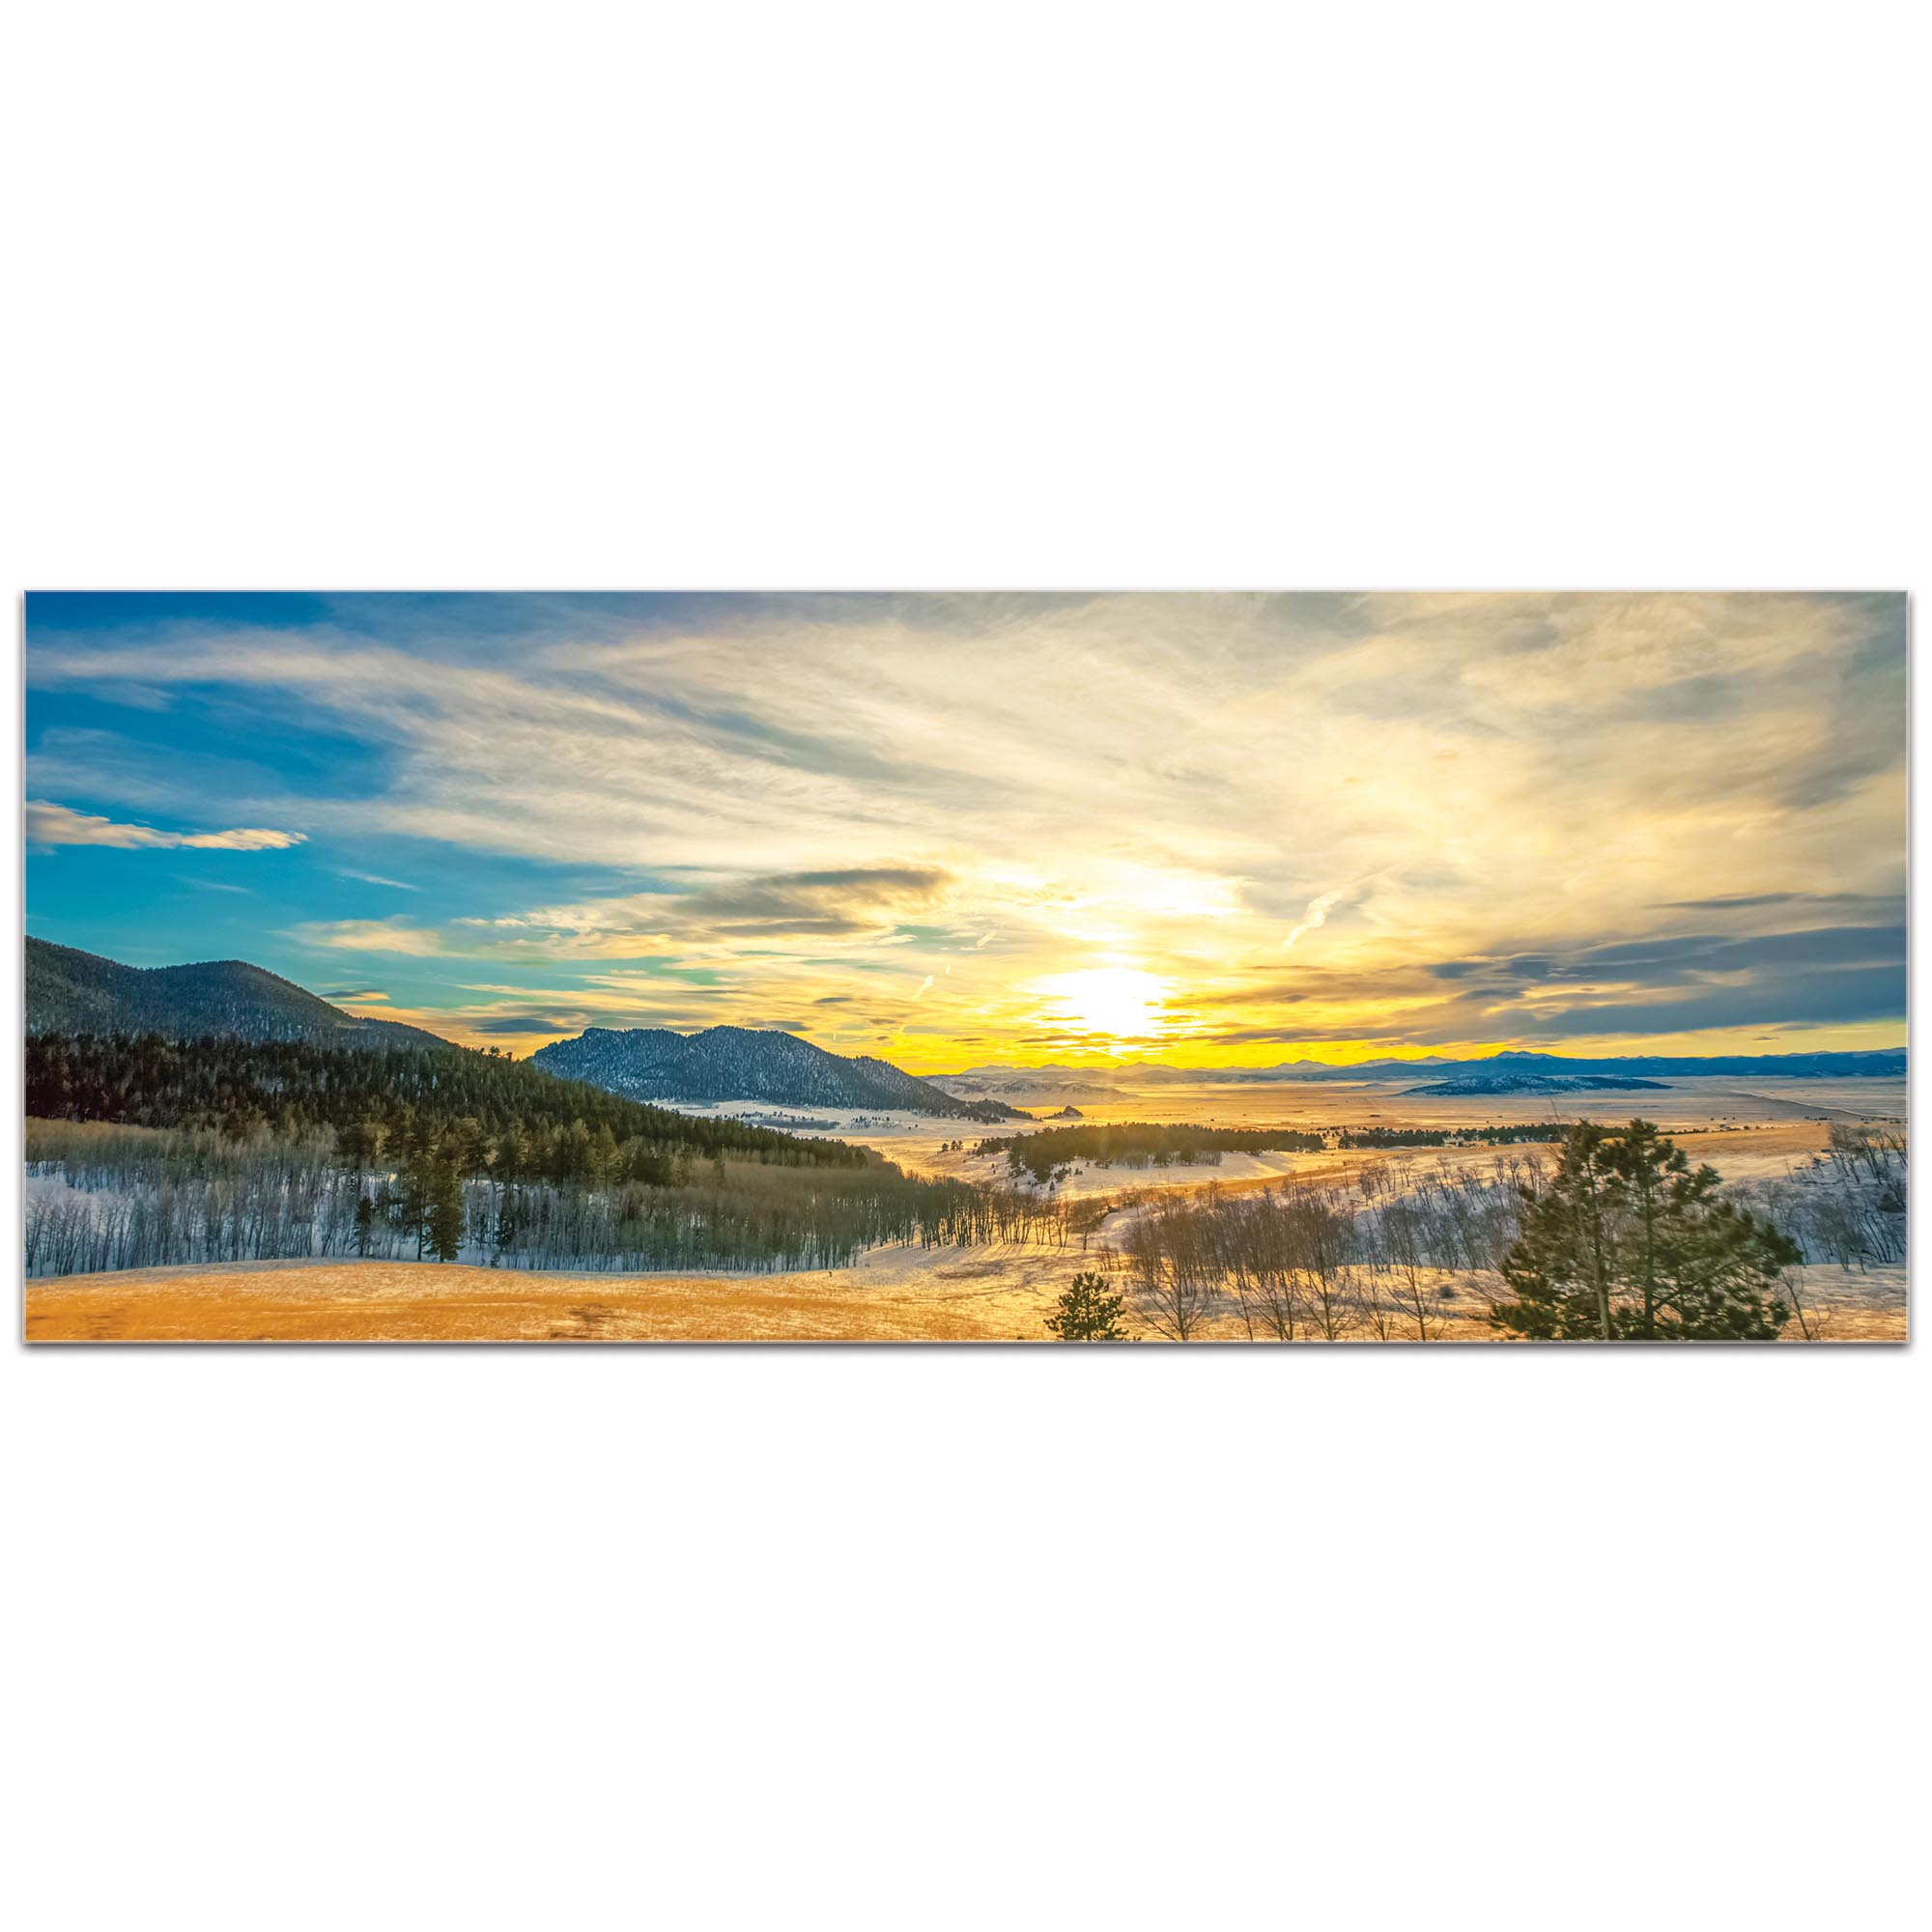 Landscape Photography 'Brisk Sunset' - Winter Sunset Art on Metal or Plexiglass - Image 2